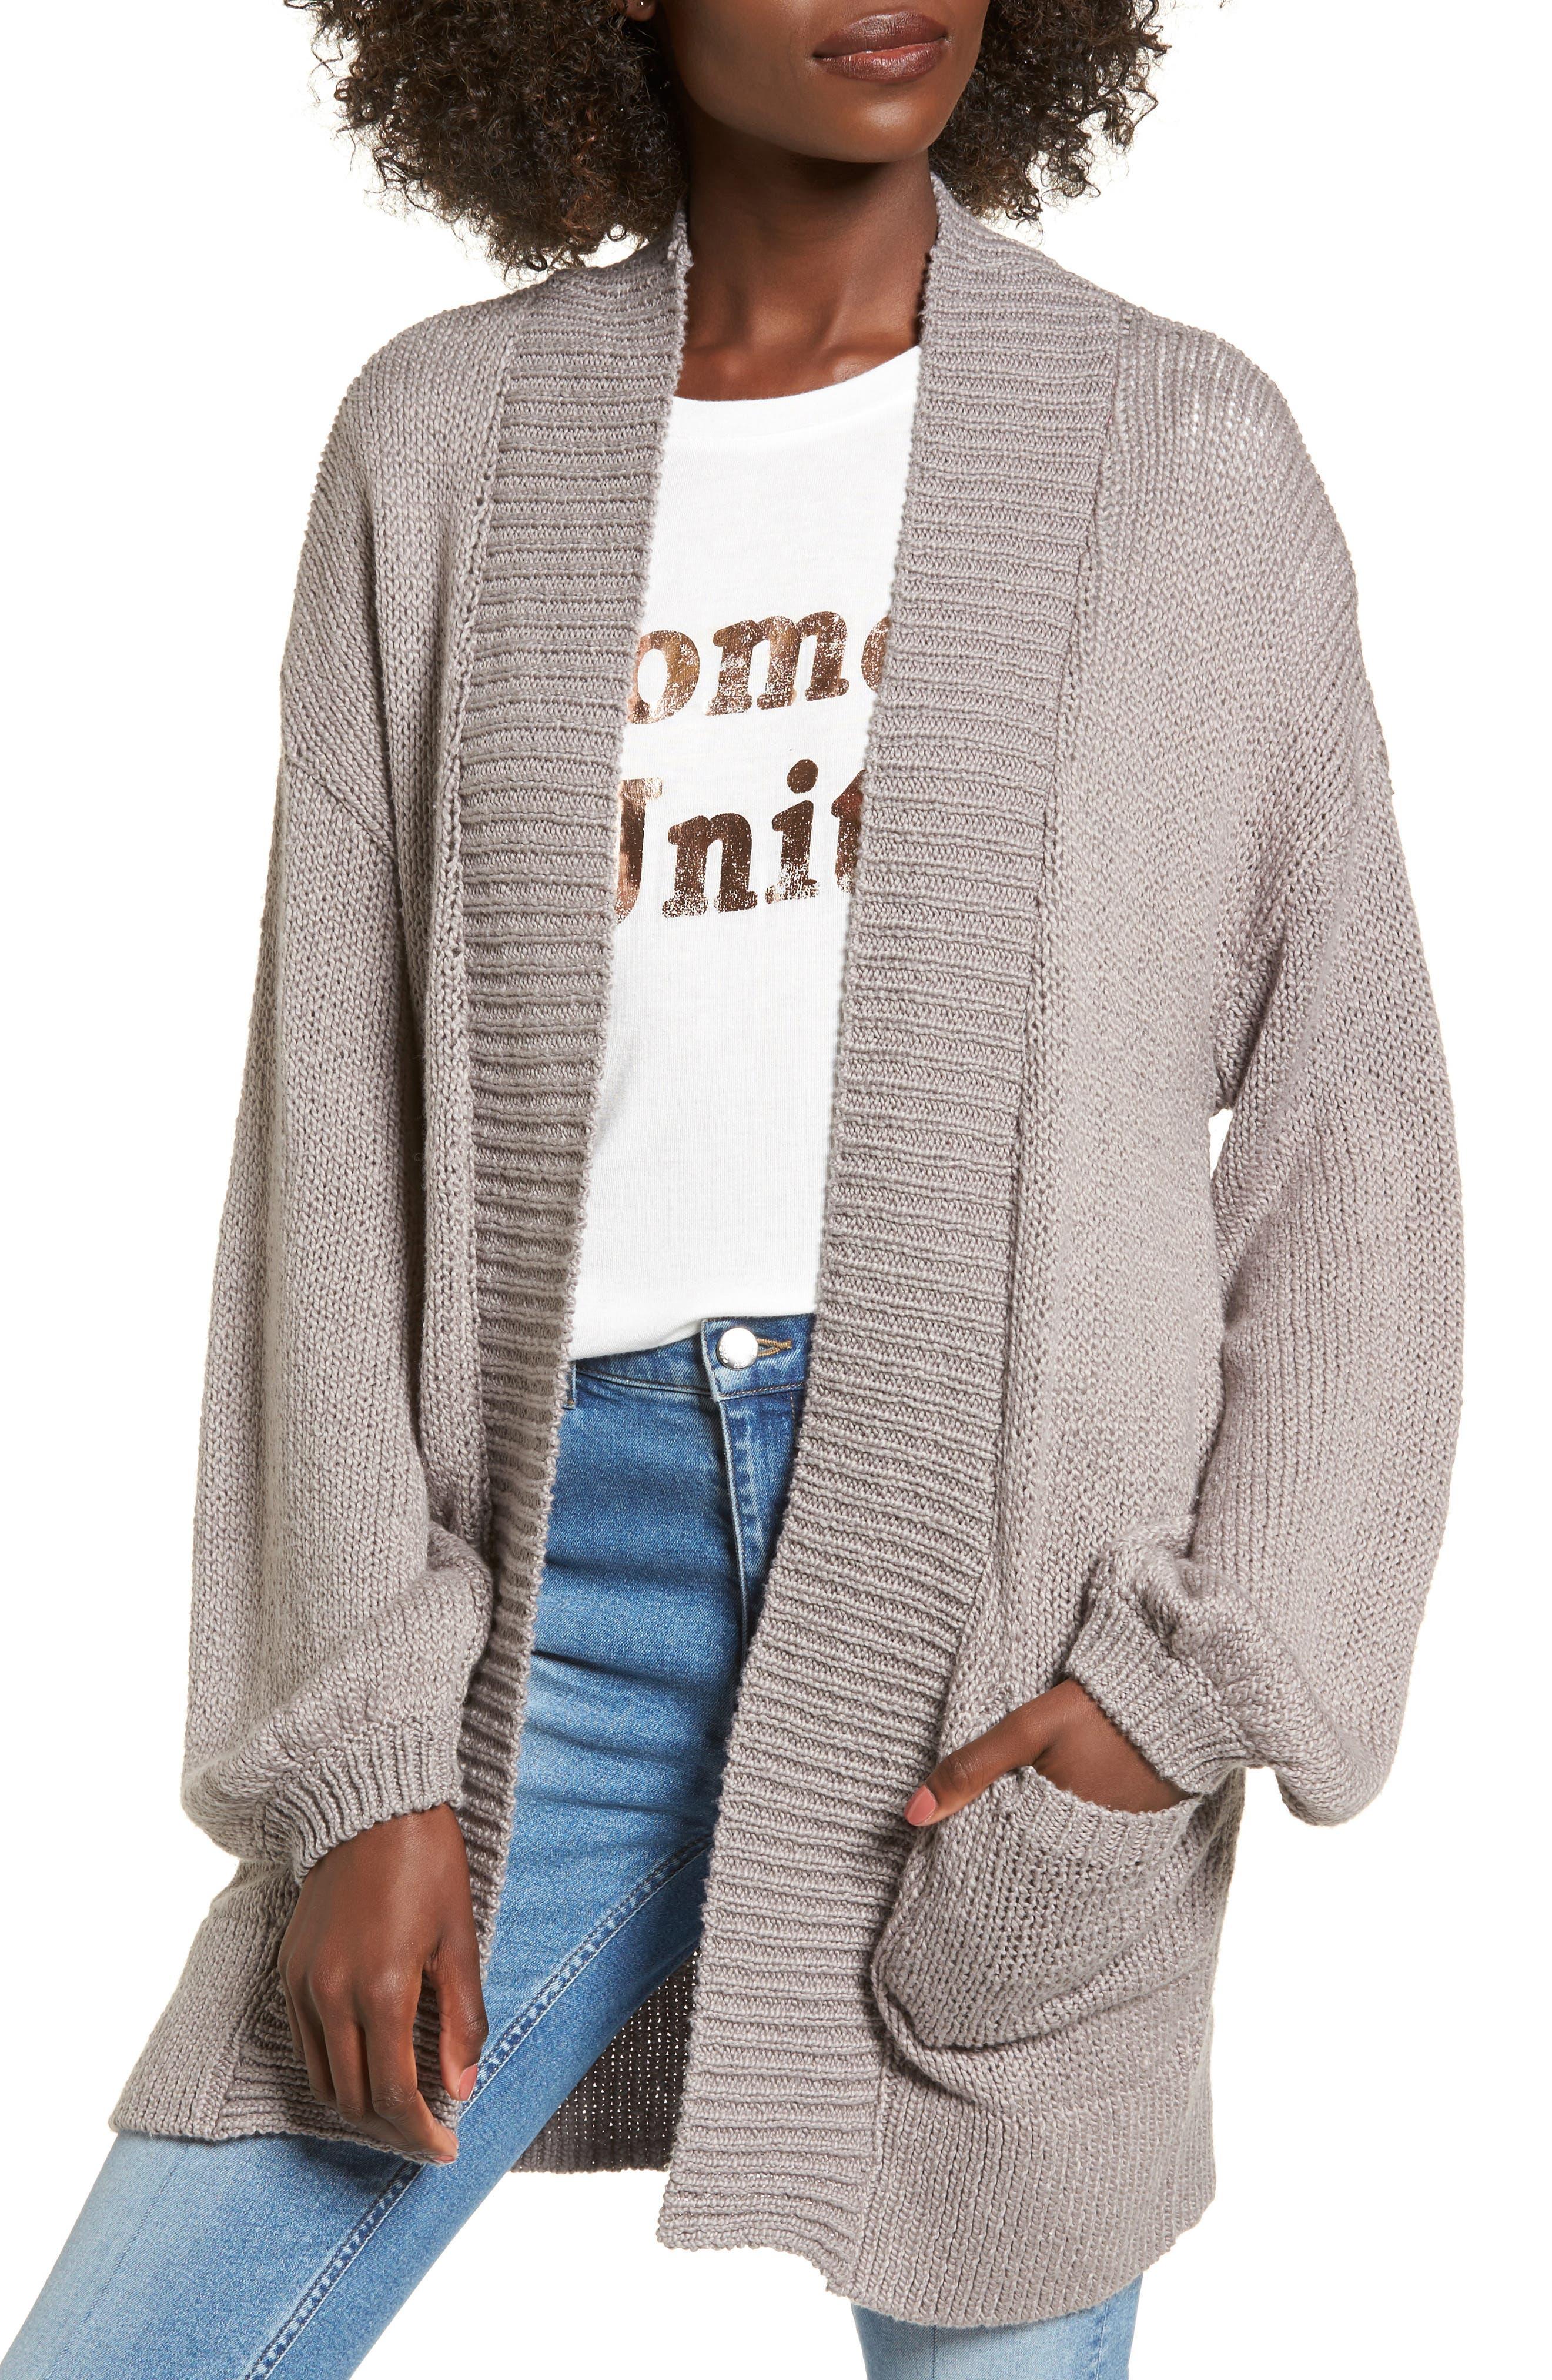 Alternate Image 1 Selected - BP. Blouson Sleeve Knit Cardigan